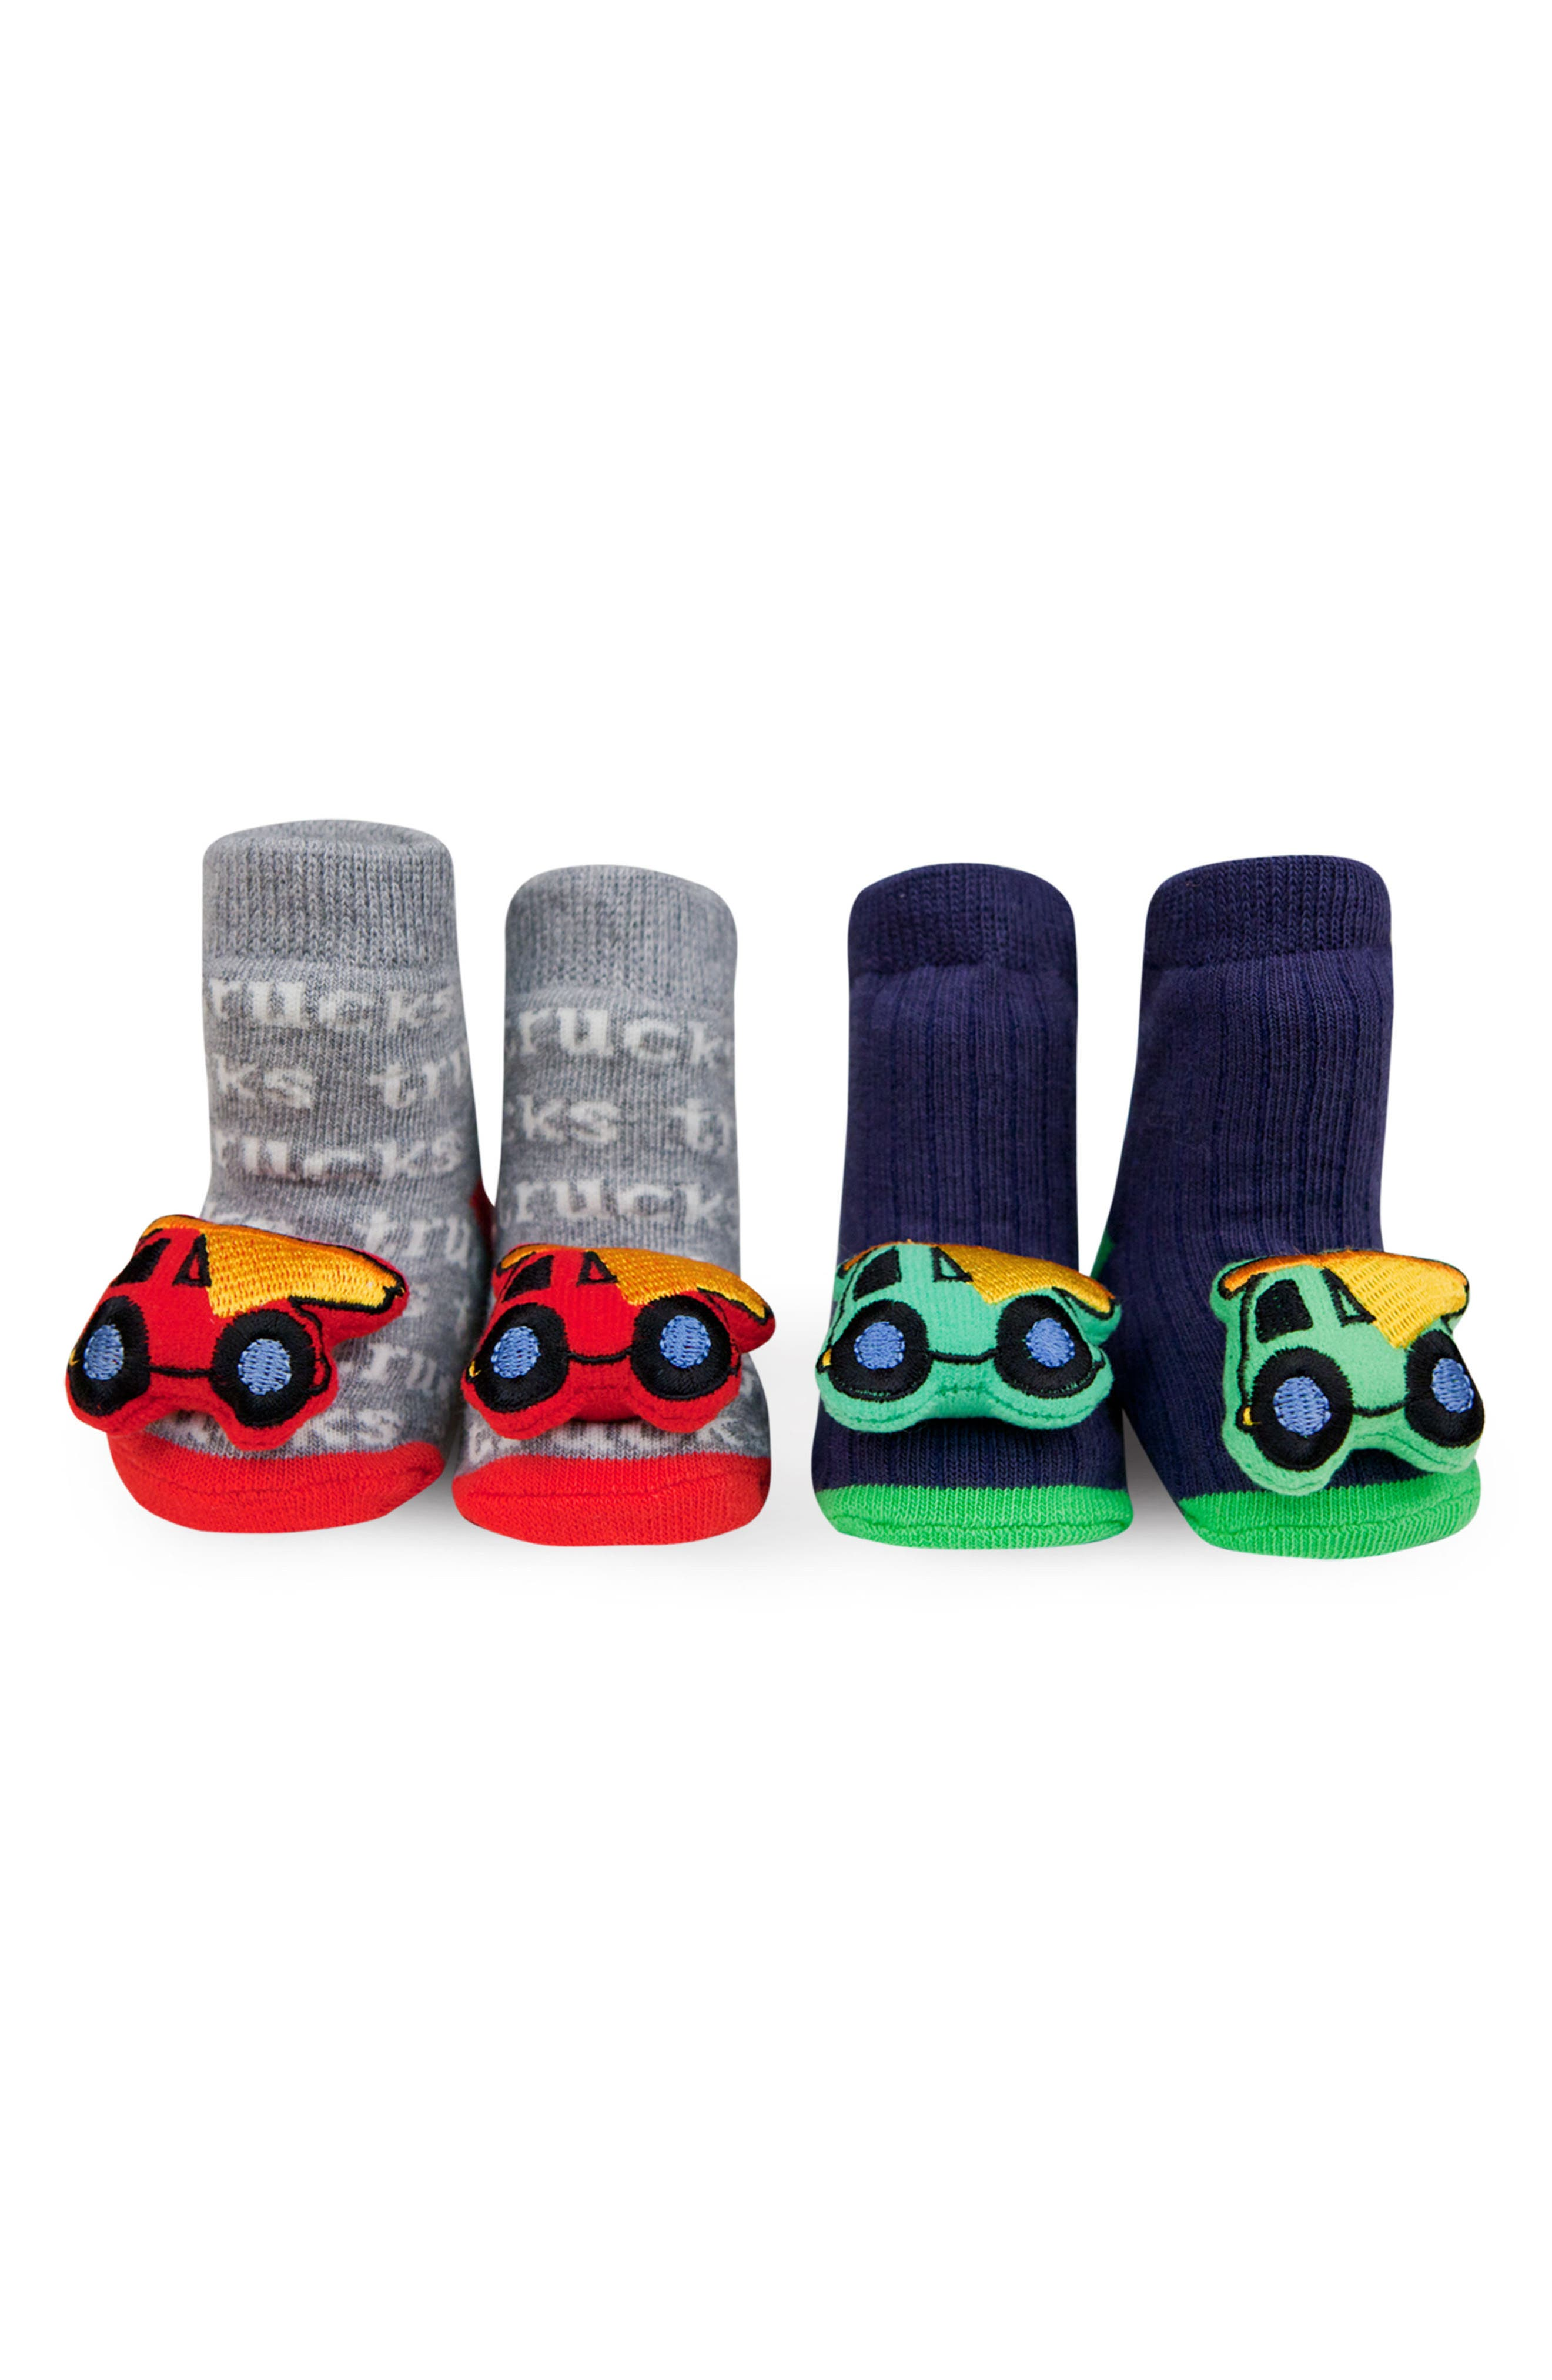 & Friends 2-Pack Vehicle Rattle Socks,                             Main thumbnail 1, color,                             601